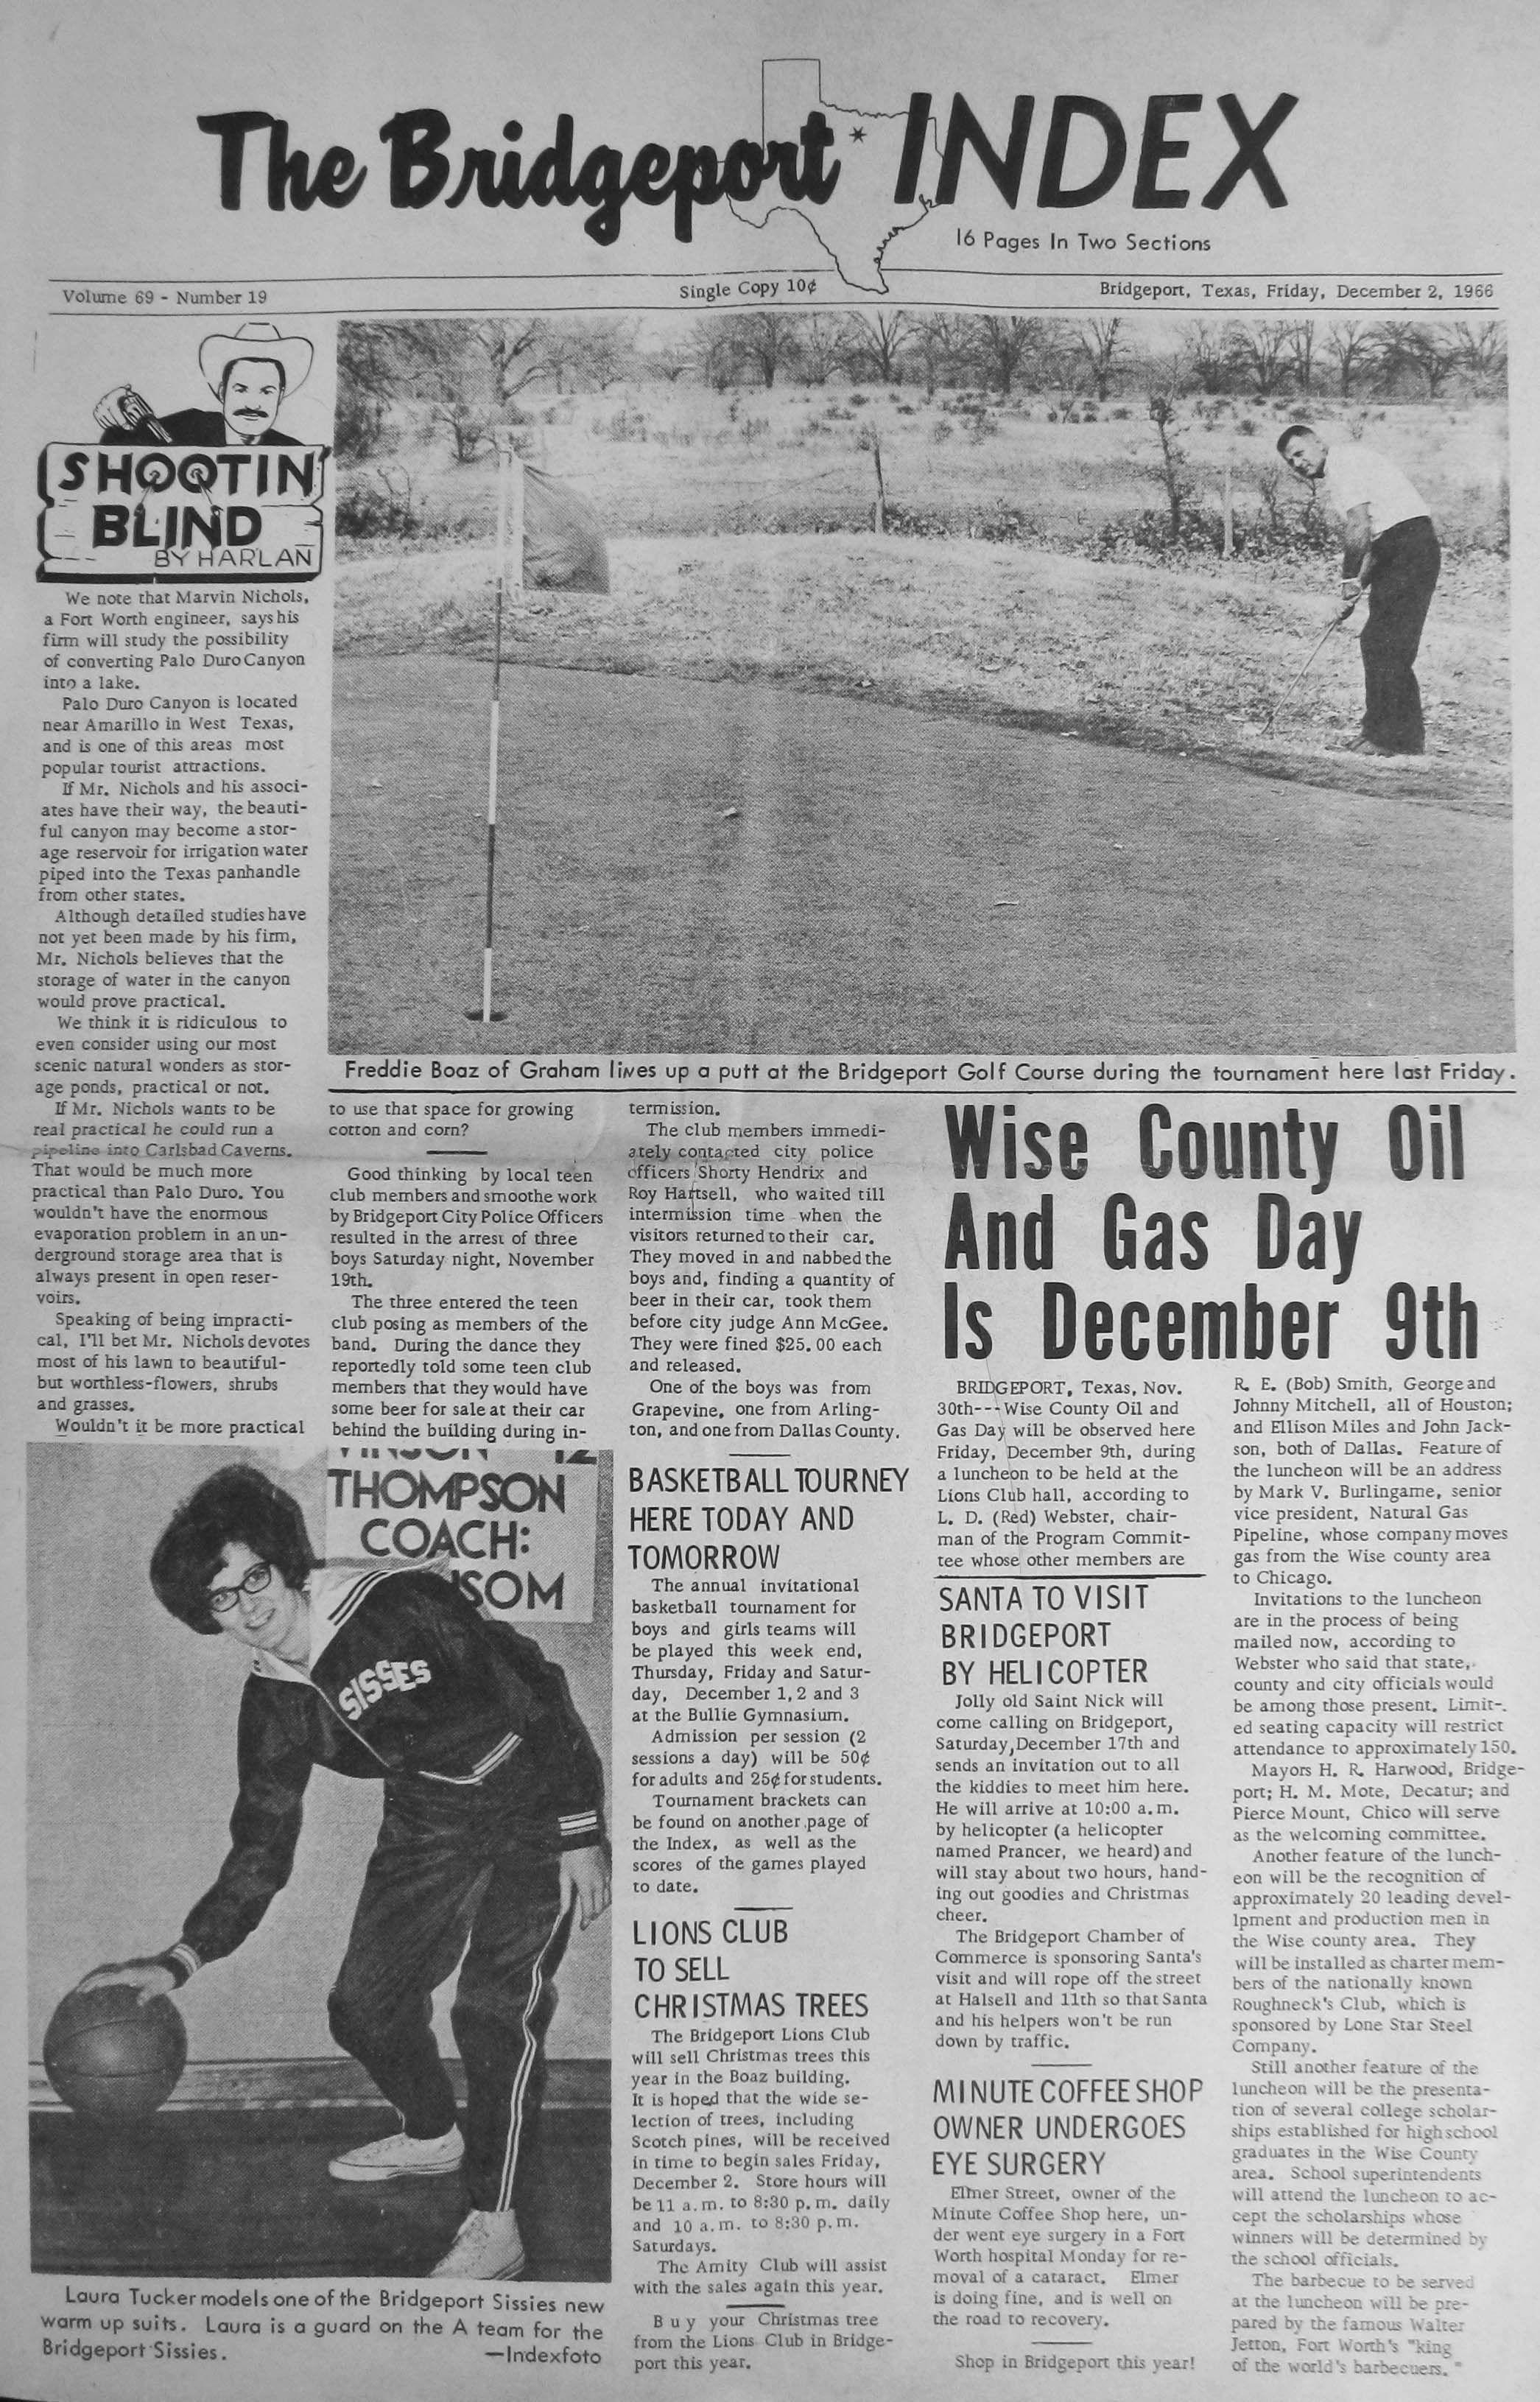 http://www.wisecountytexas.info/bridgeportindex/images/1966/1966-12-02-pg01.jpg